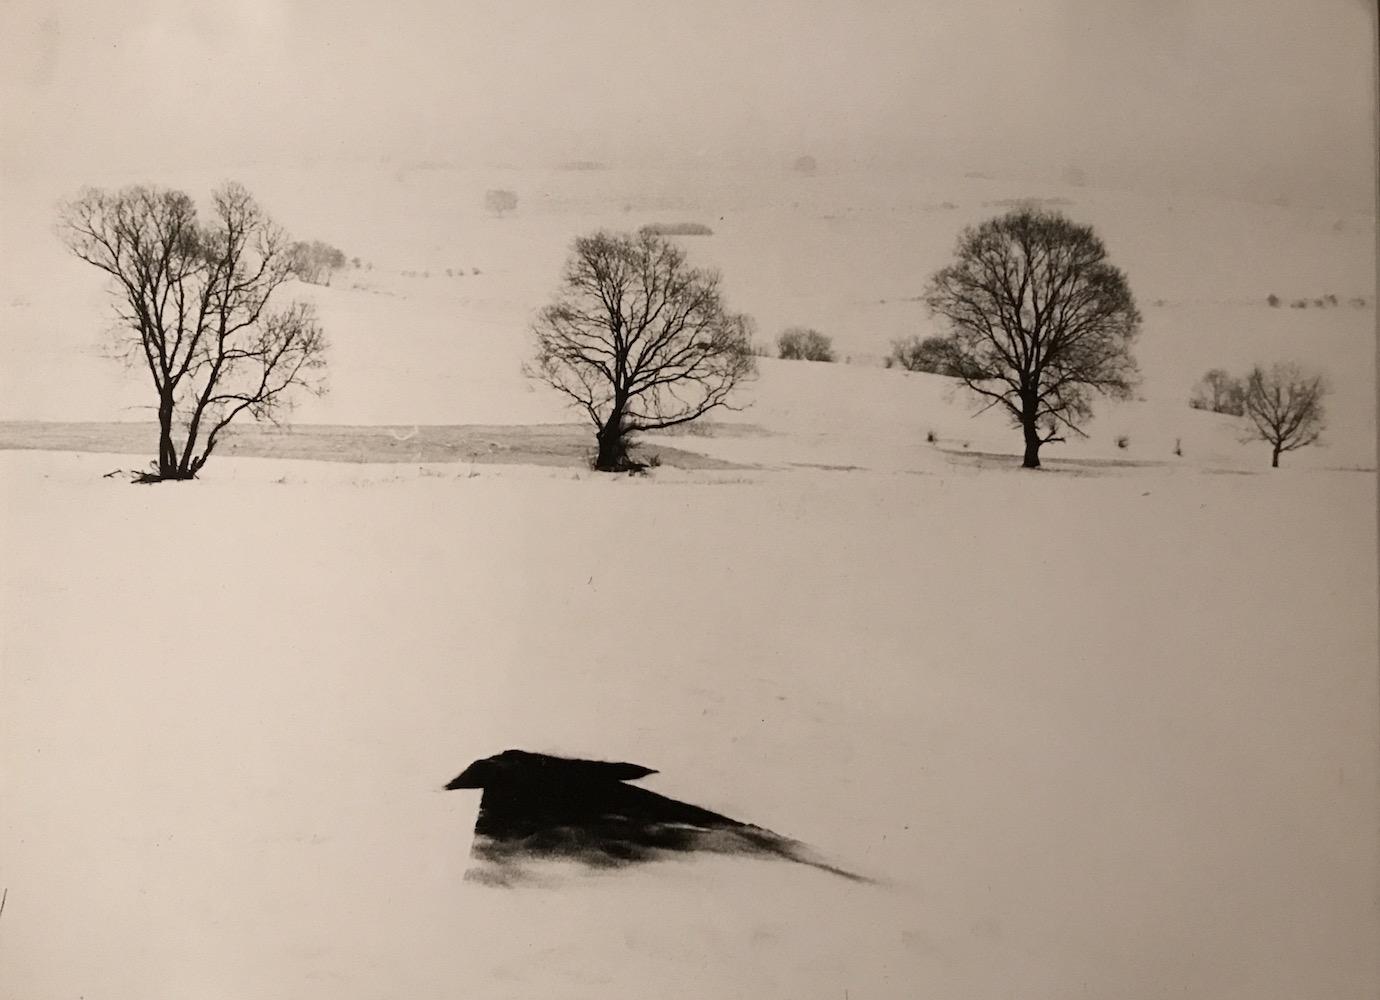 1970, Z mesta von 9, foto L. Paule, 30x40 cm